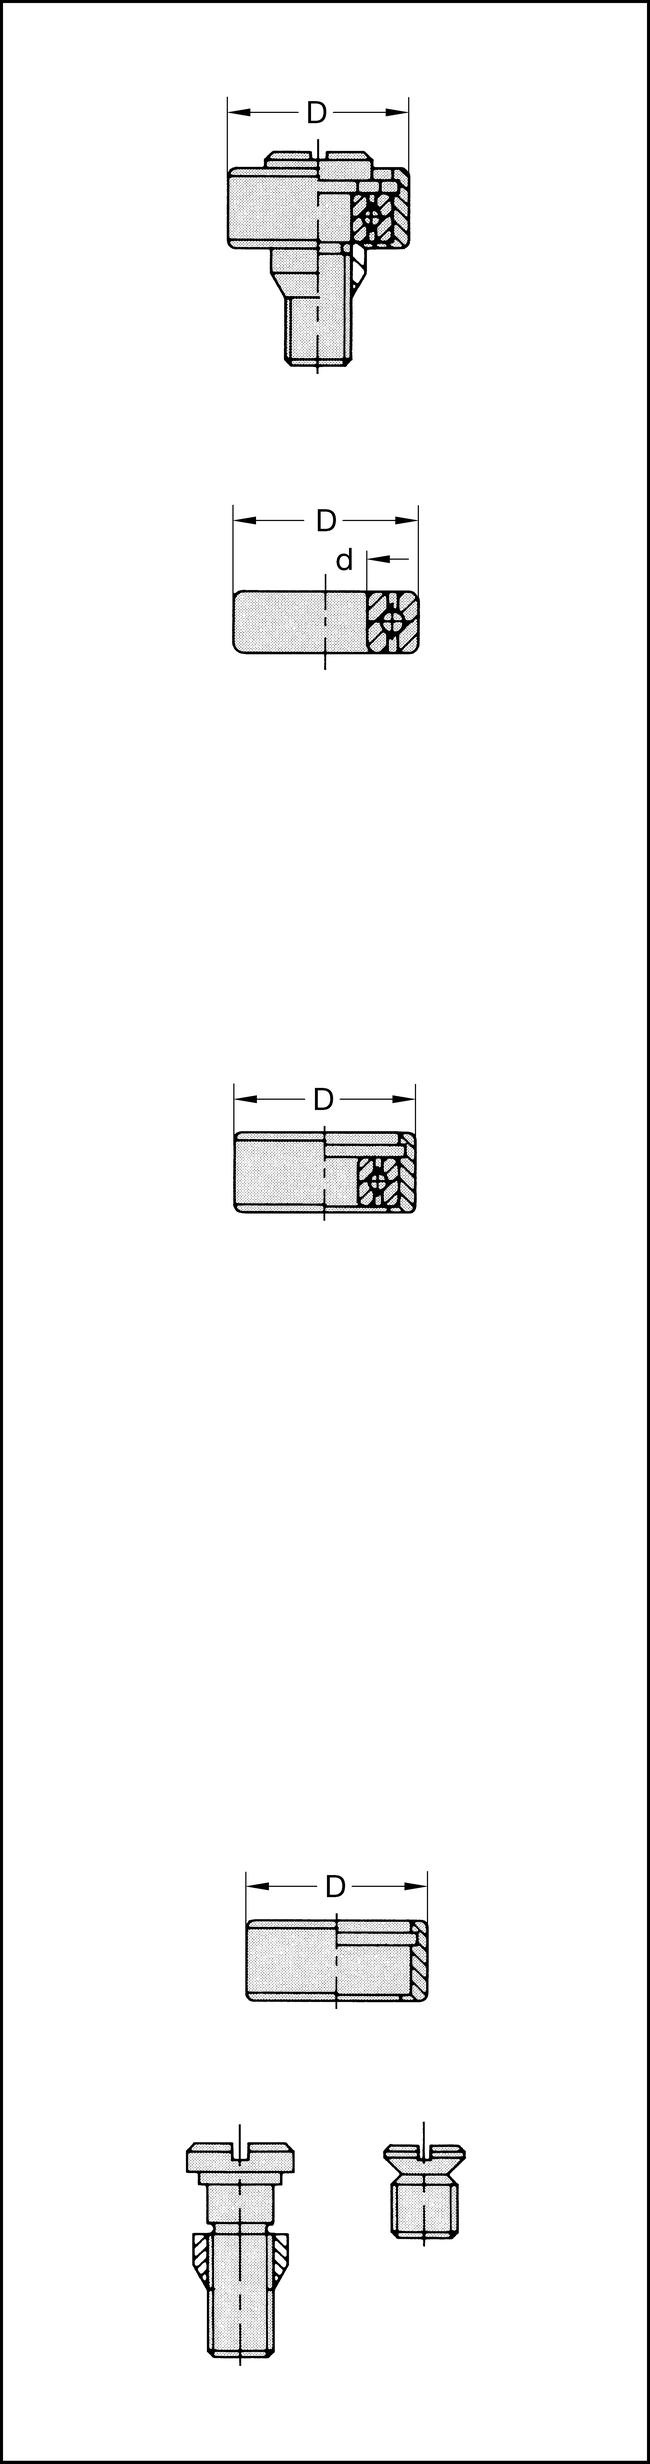 Kugellager 15x5mm / d=6mm